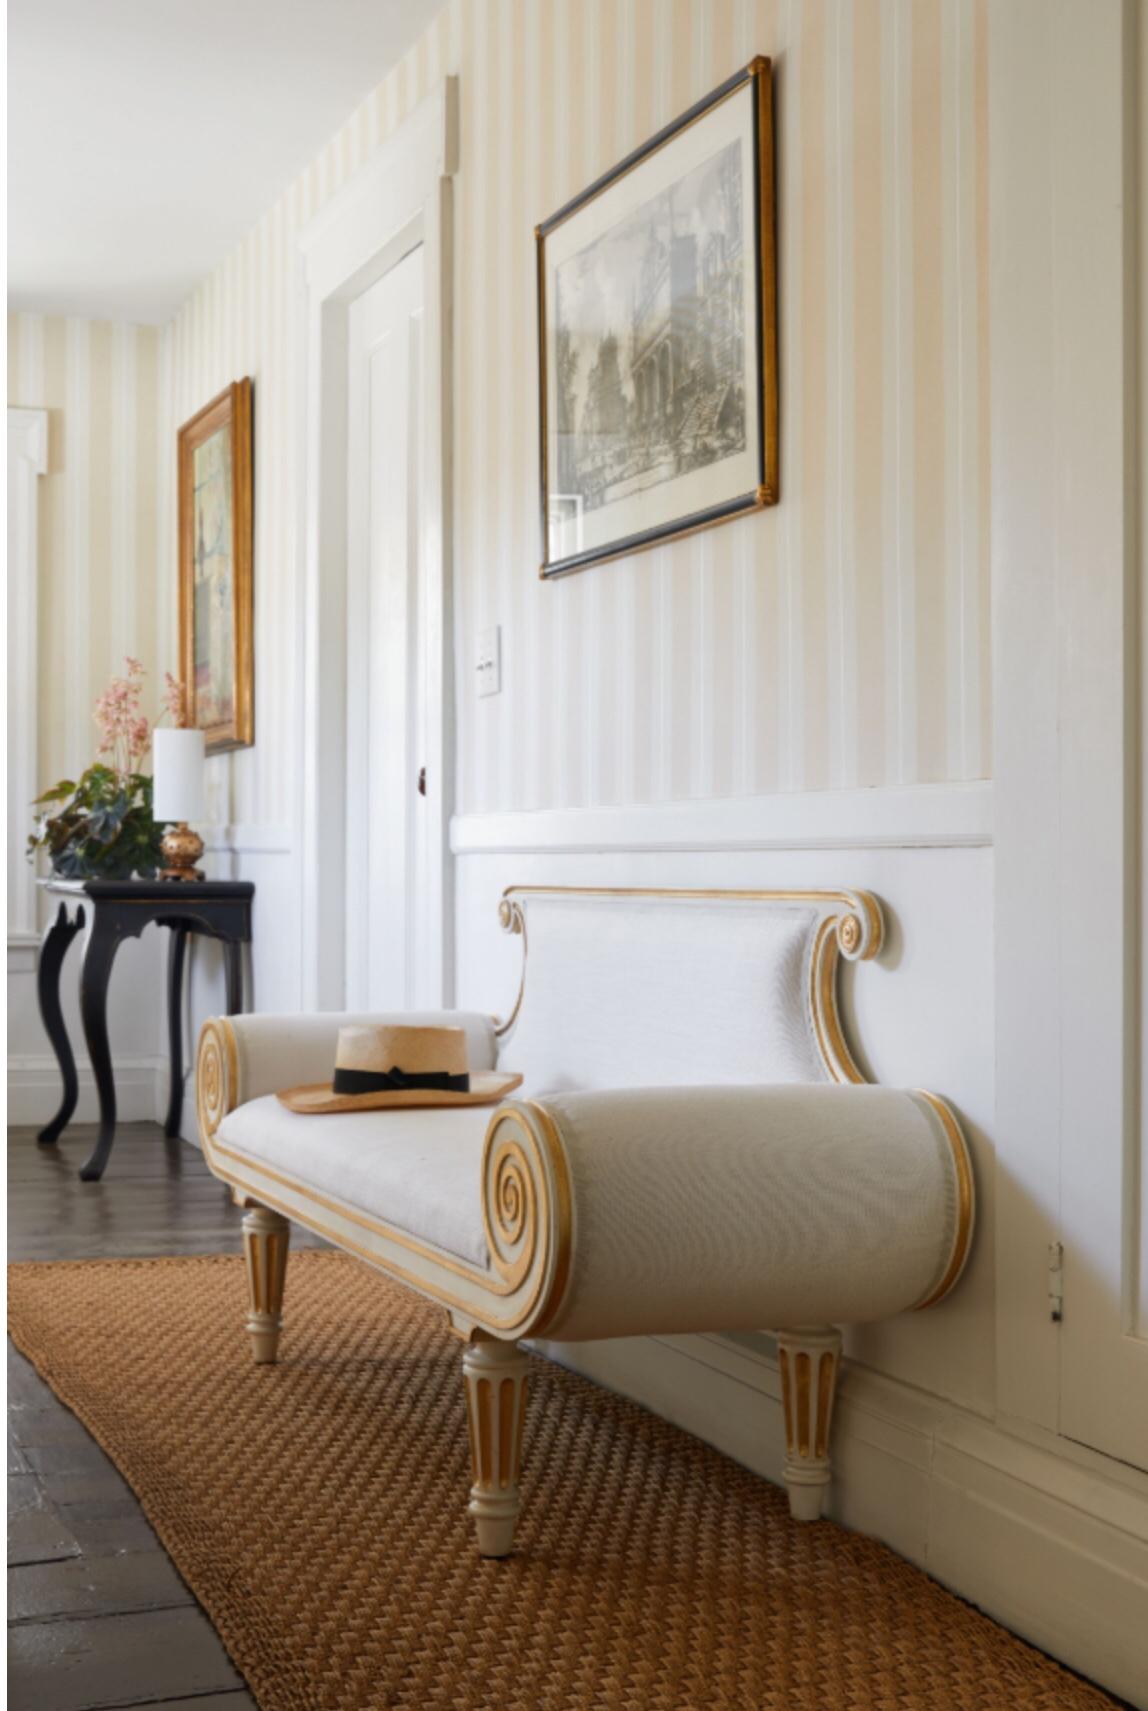 Beautiful settee designed by Bunny Williams, inspired by Regency era